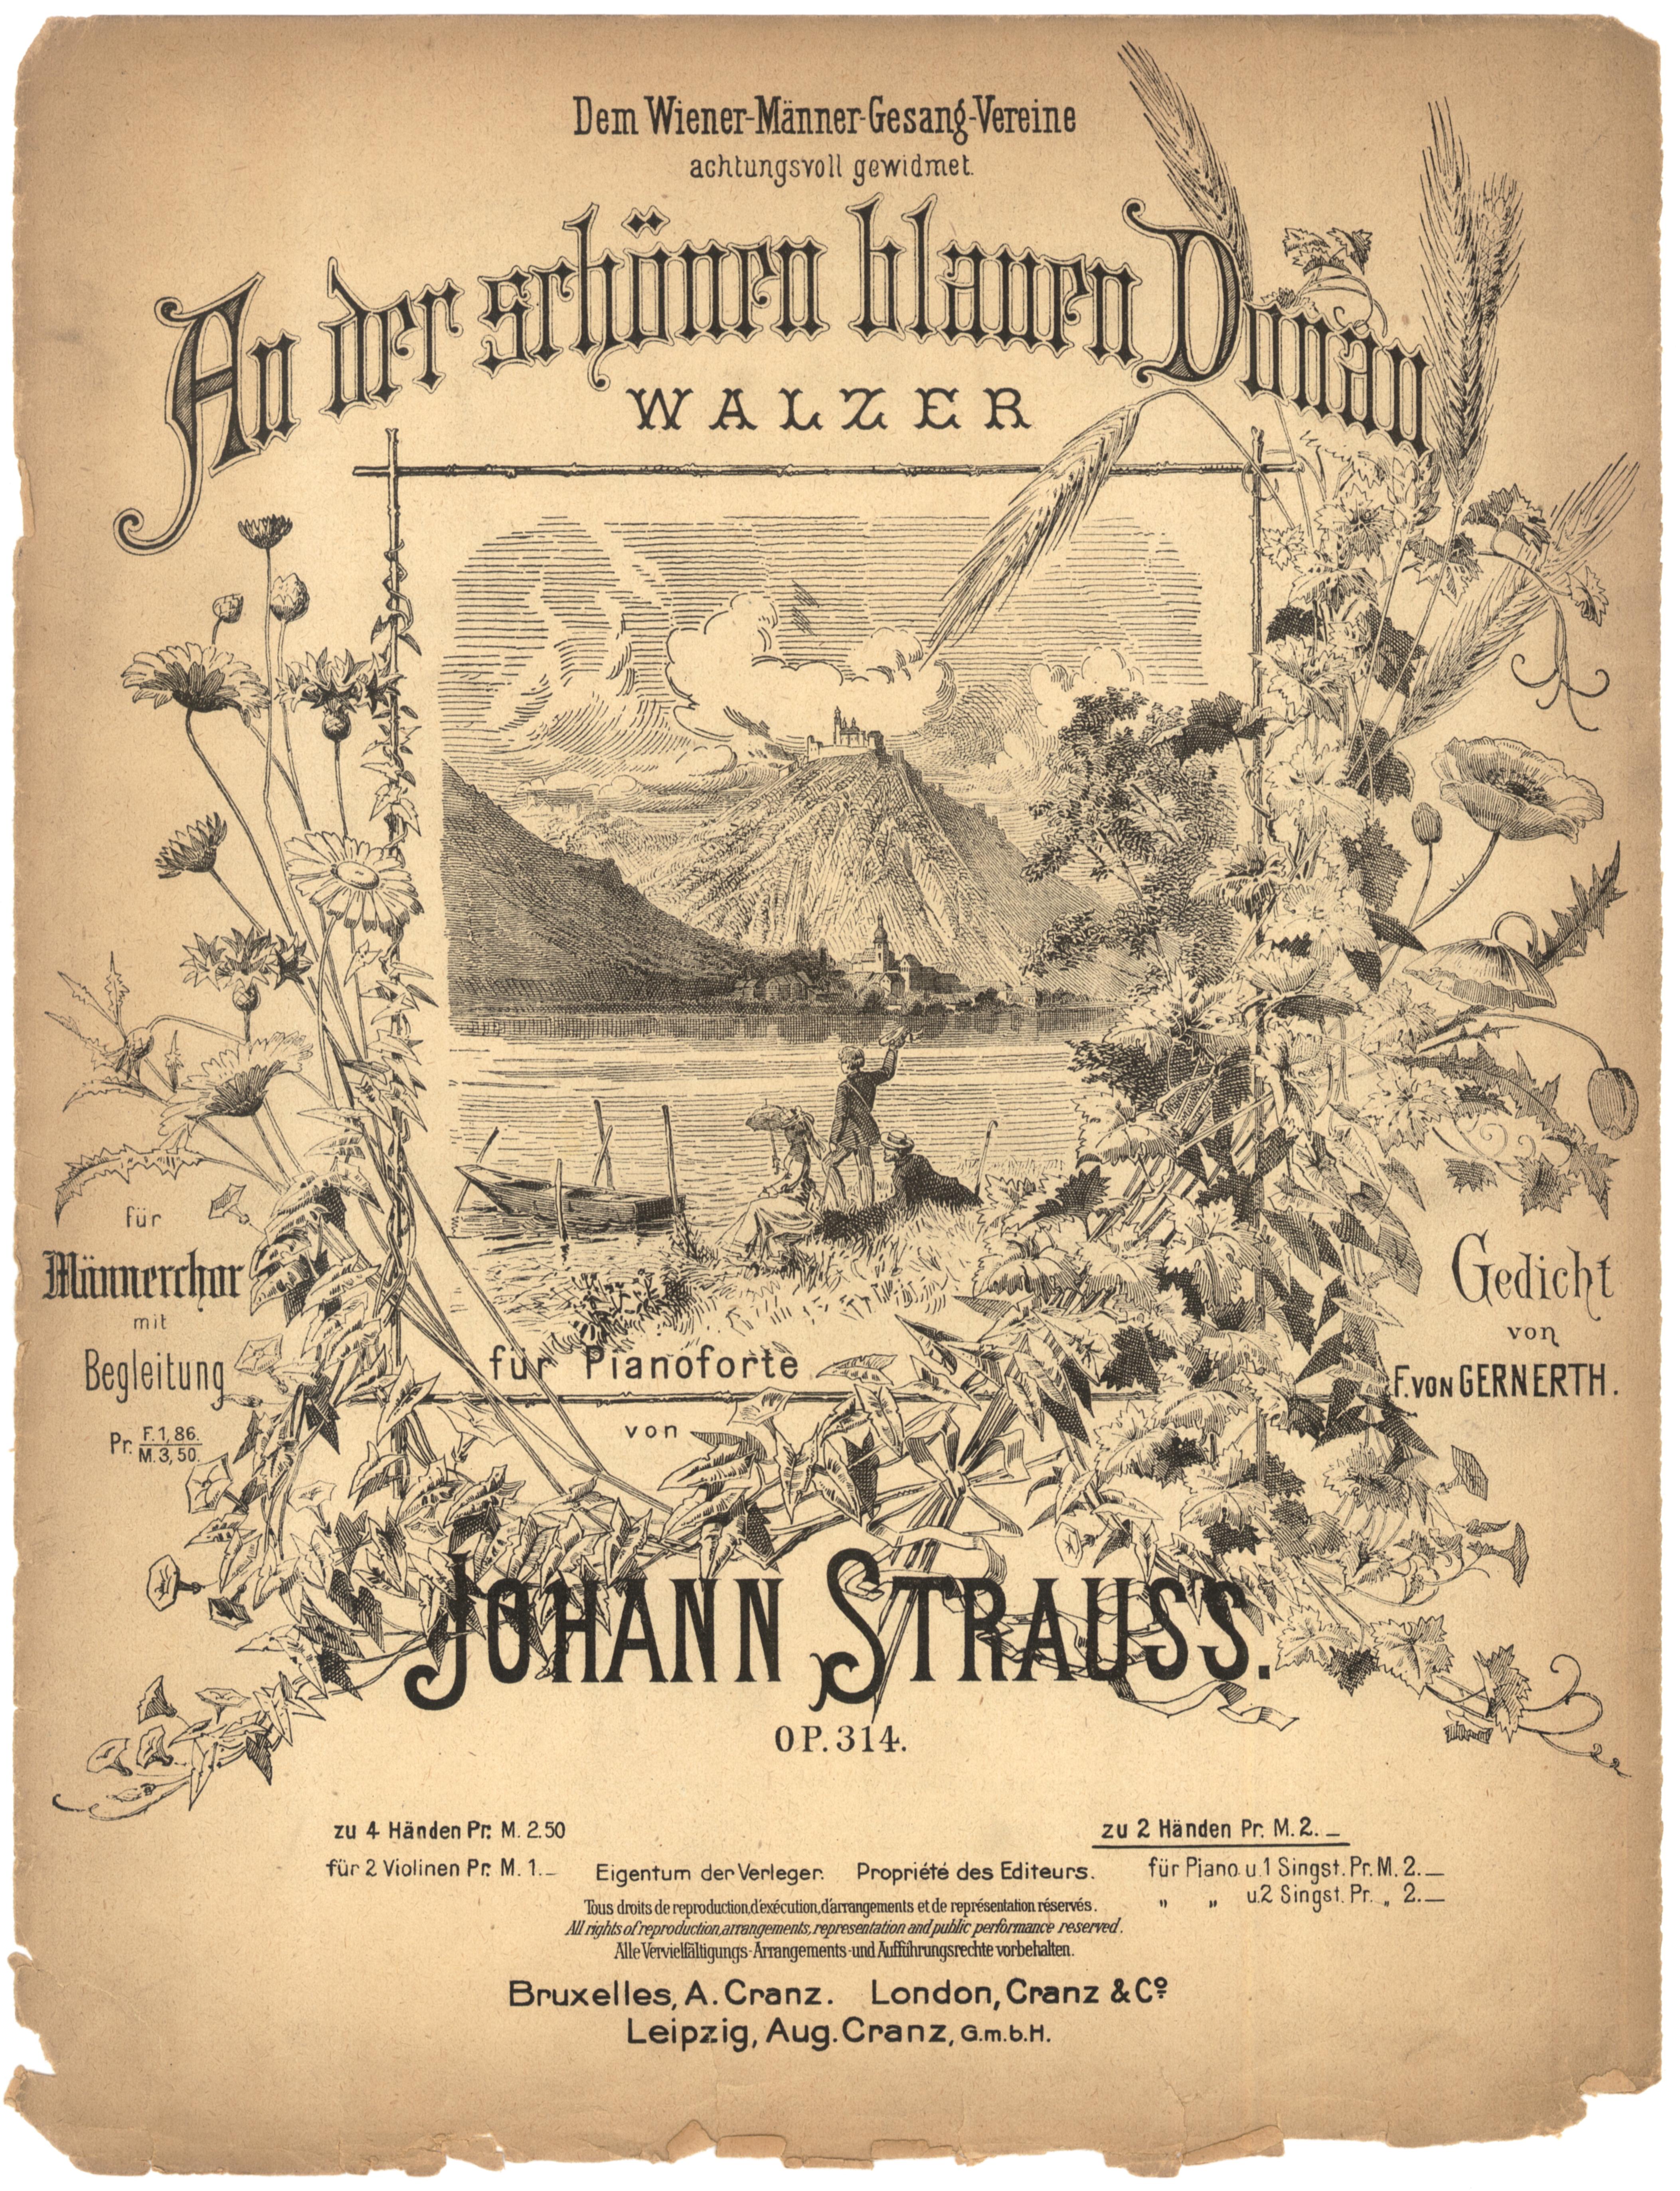 Blue Danube Waltz by Johann Strauss II (worldpress.com)